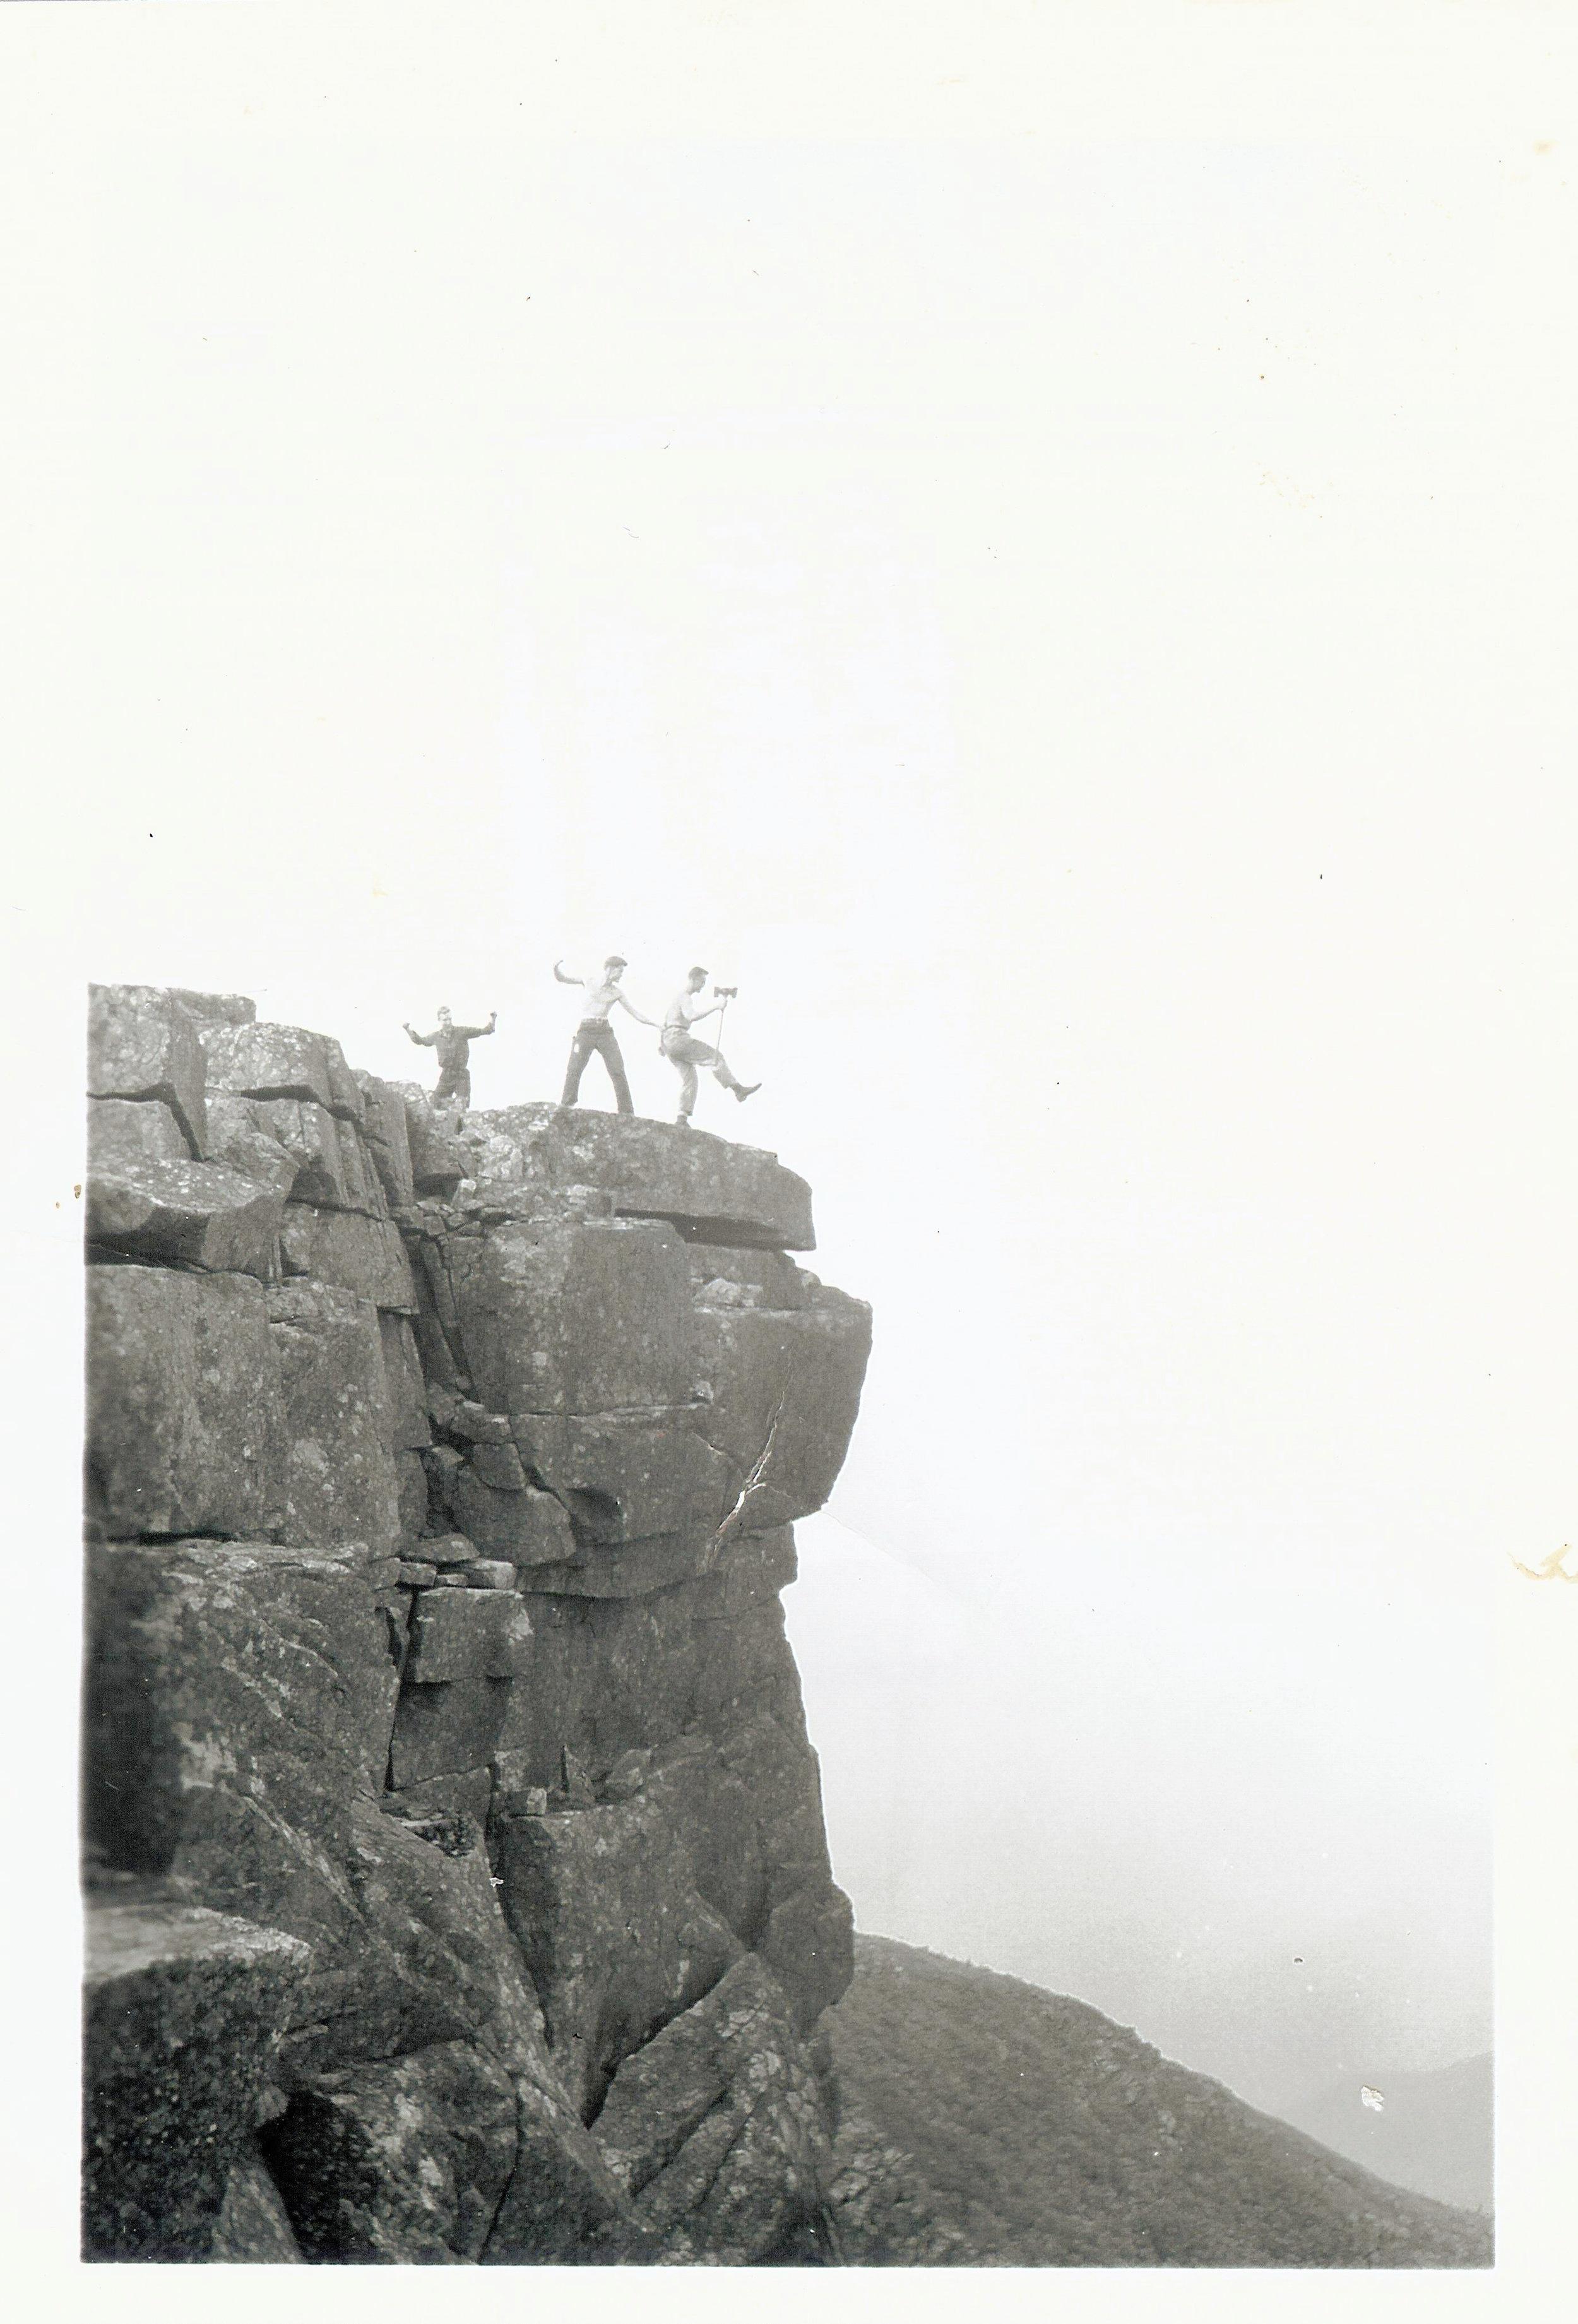 1940's - Crew on Bondcliffs